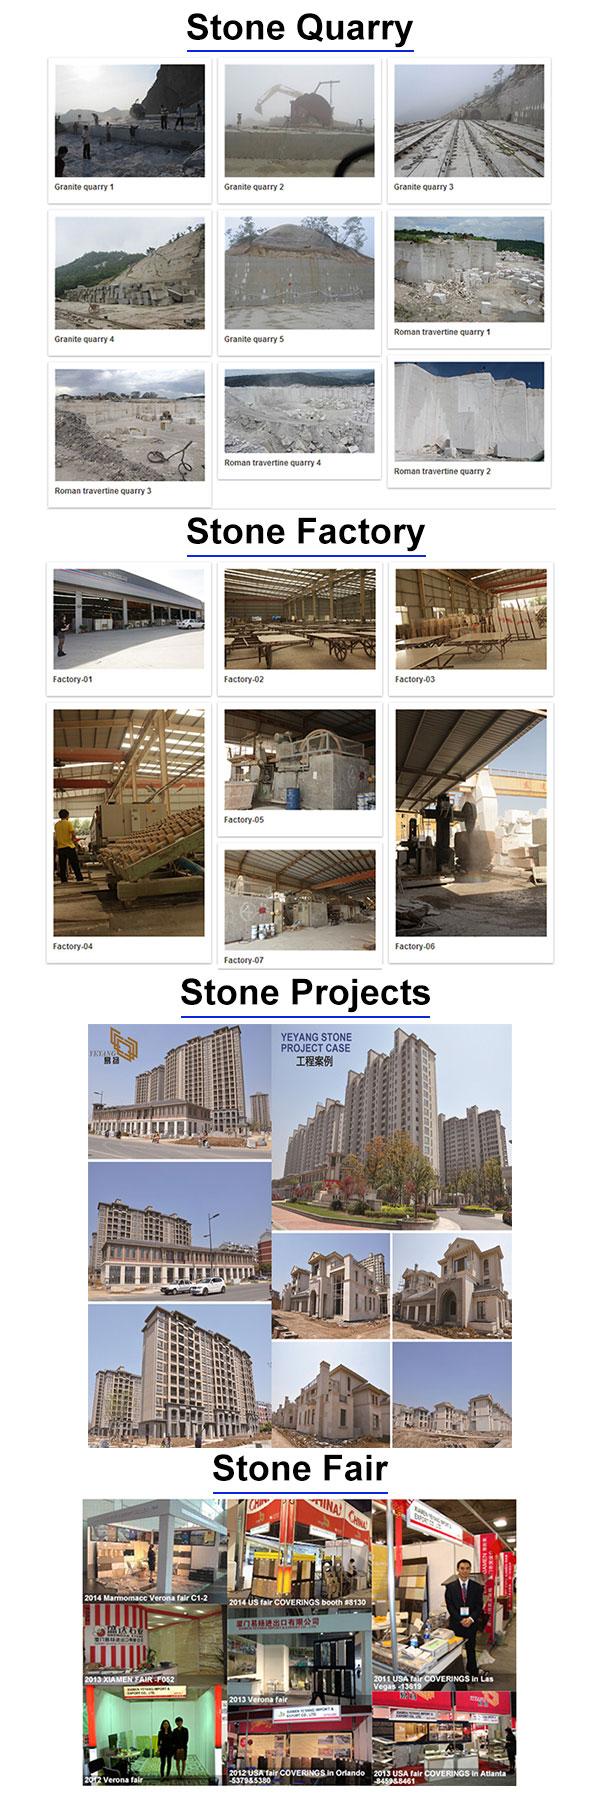 A01Quarry+factory+project+fair.jpg